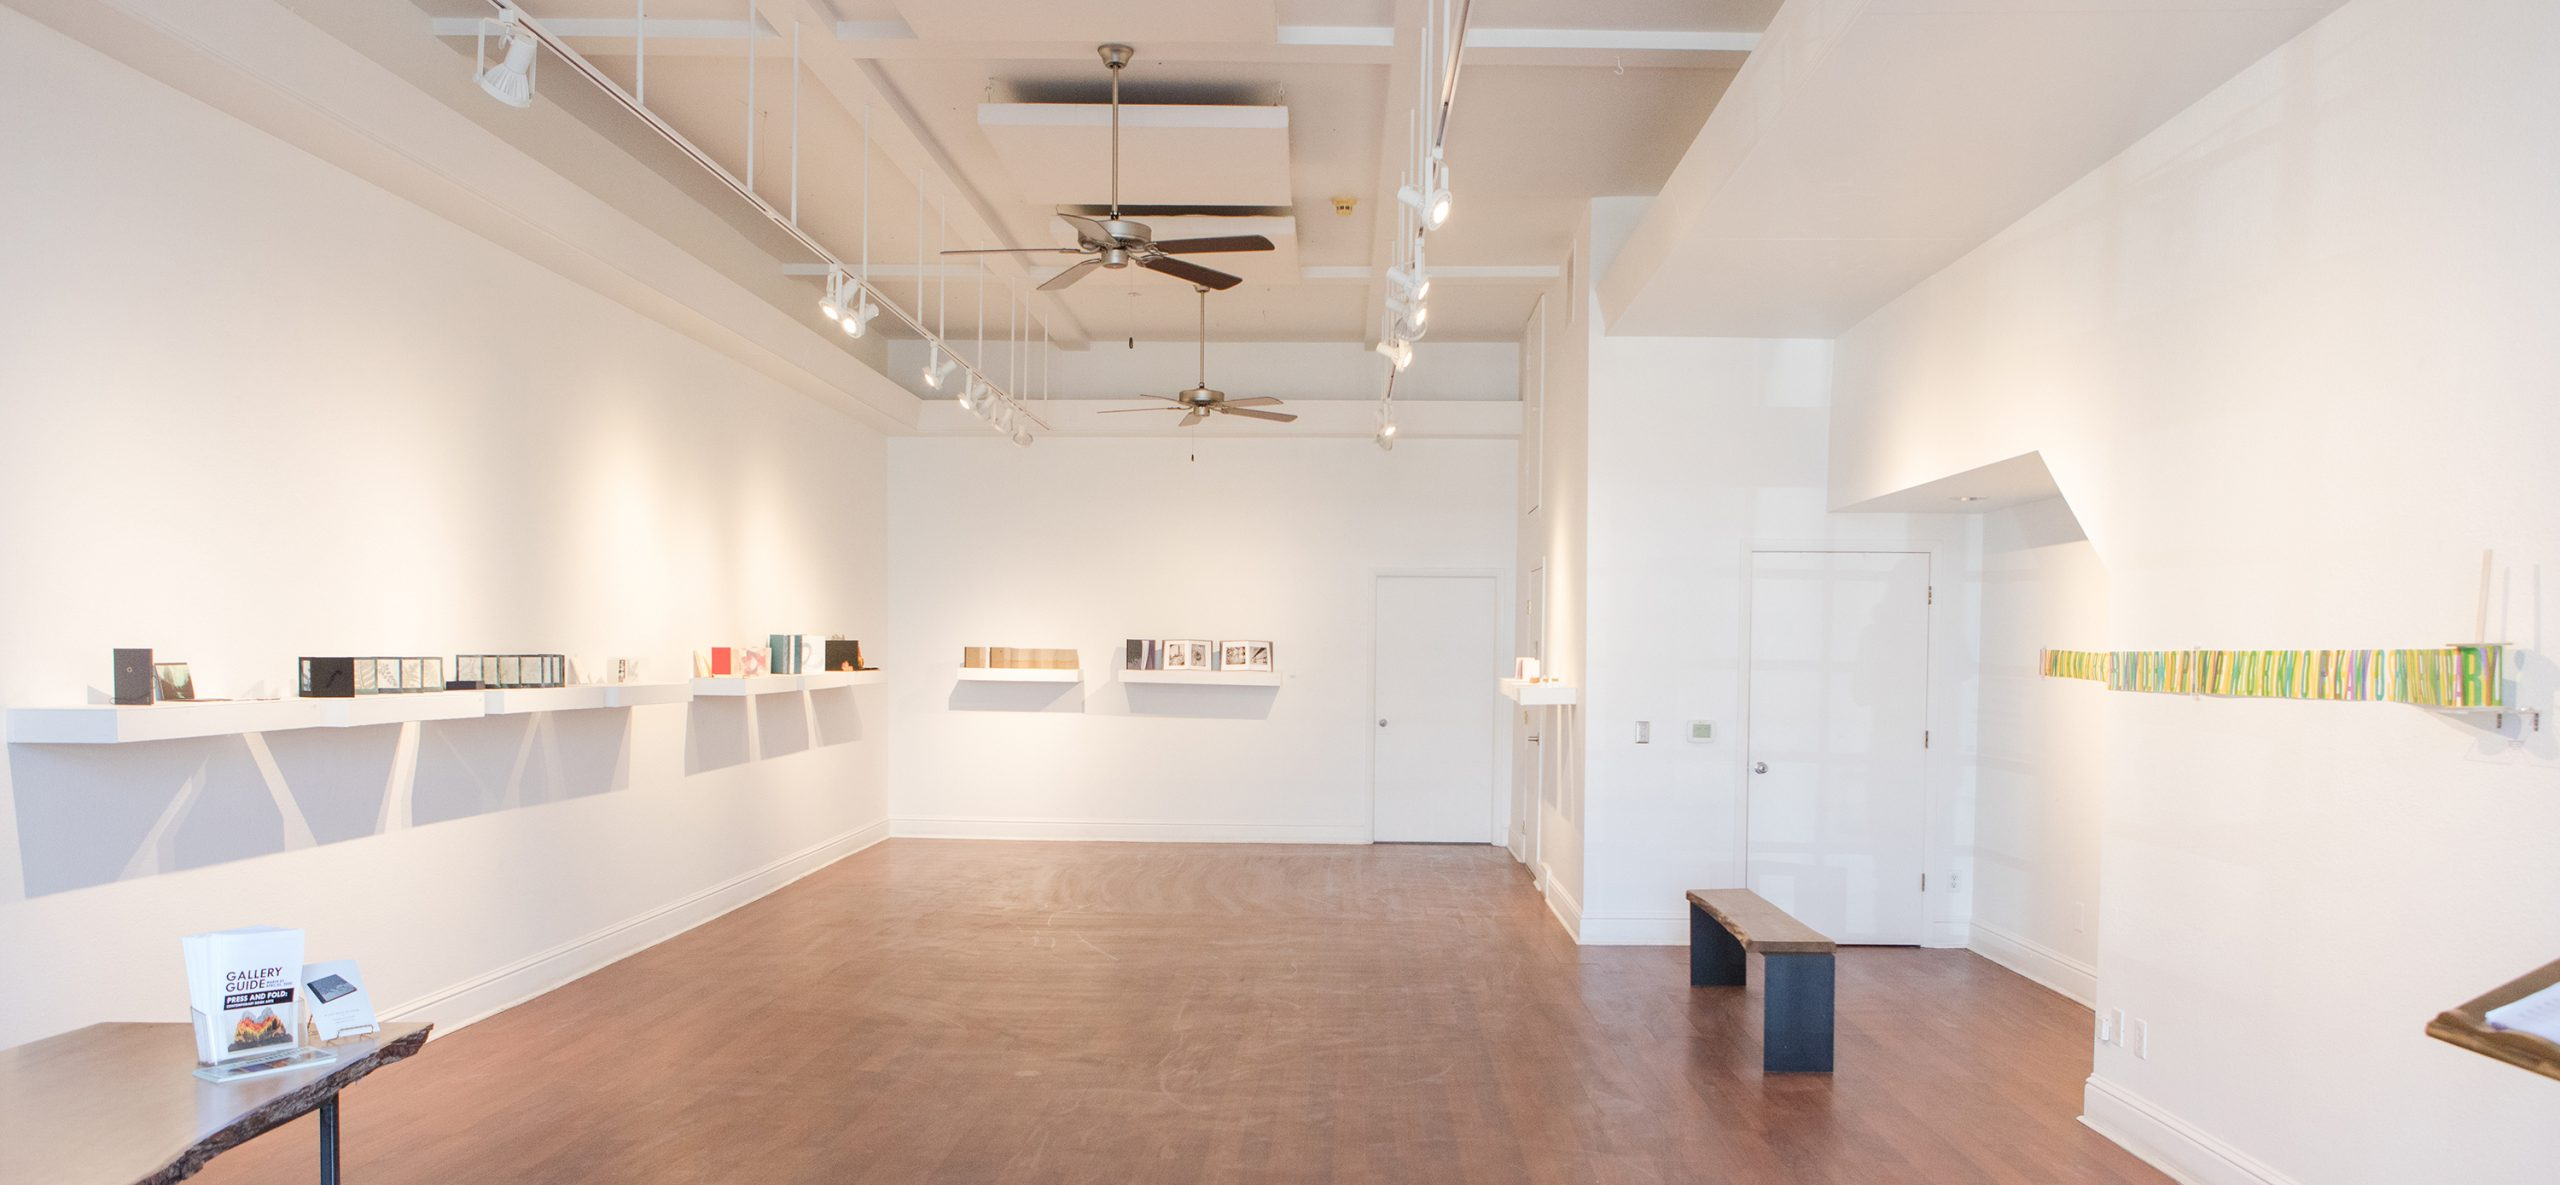 PRESS AND FOLD: CONTEMPORARY BOOK ARTS